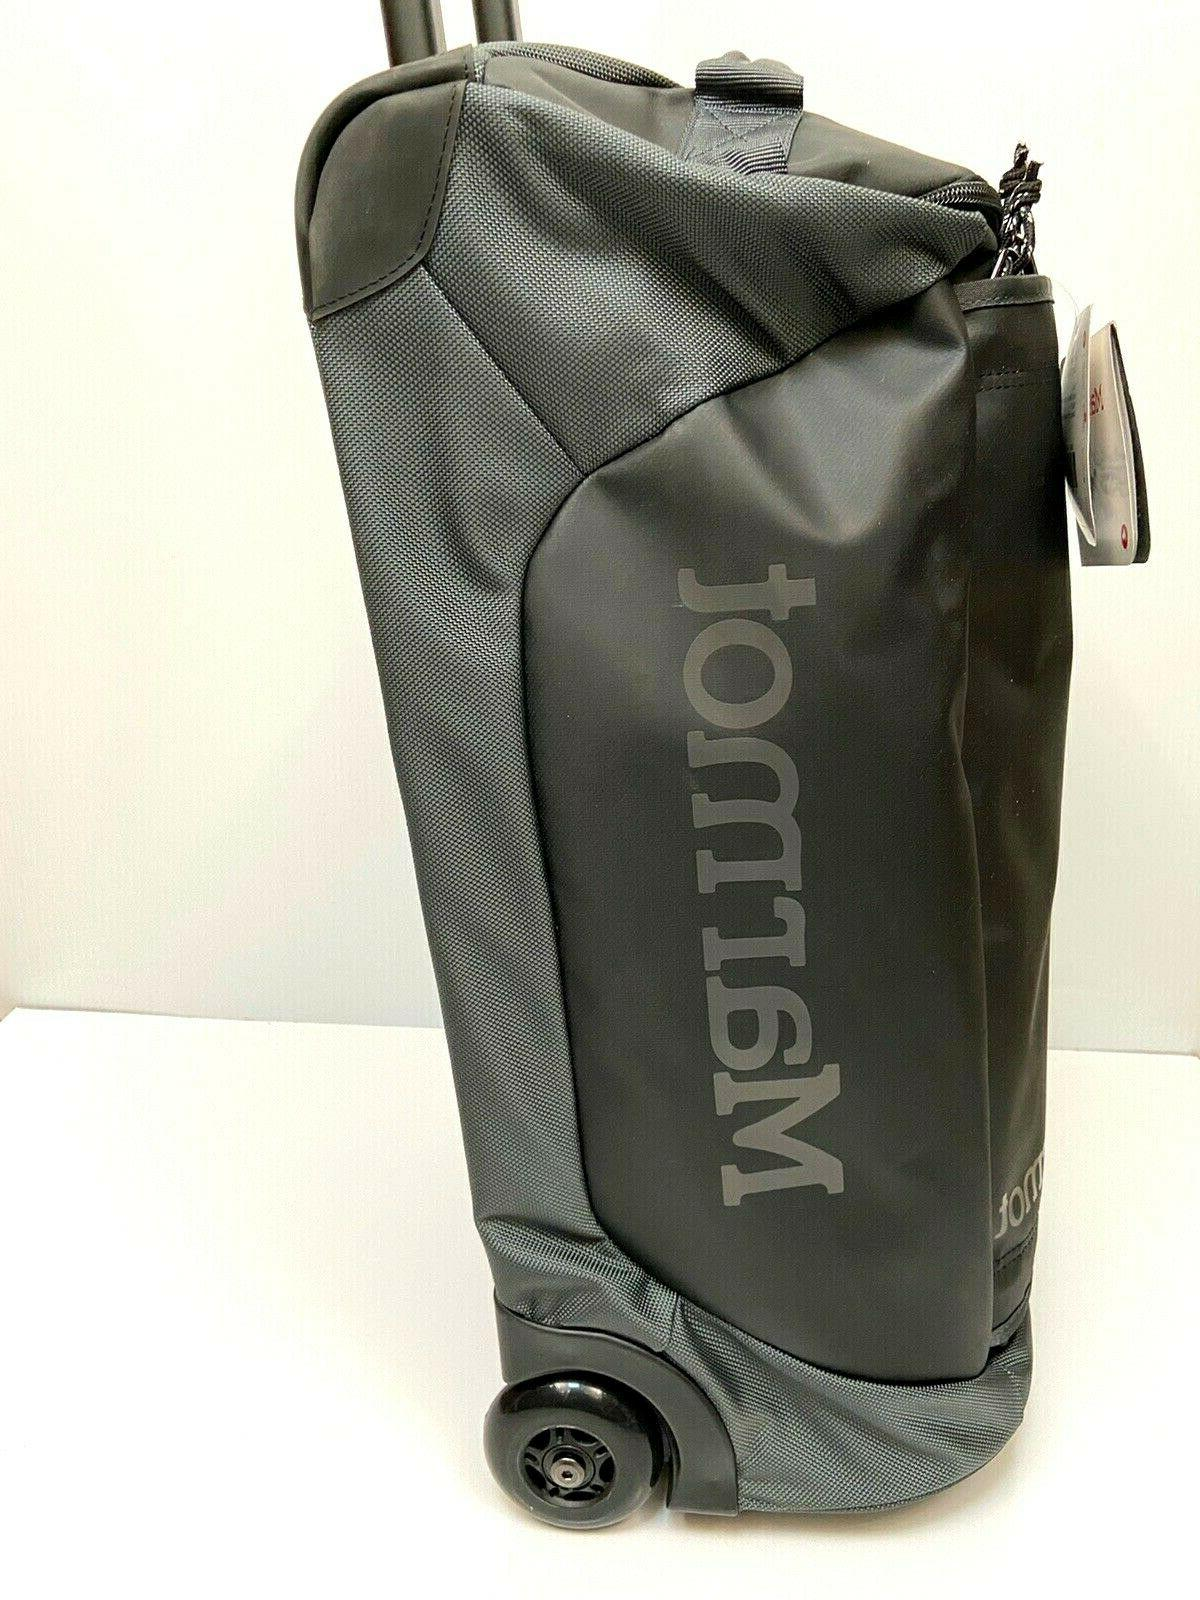 MARMOT Rolling Hauler Carry On Luggage Bag 40L